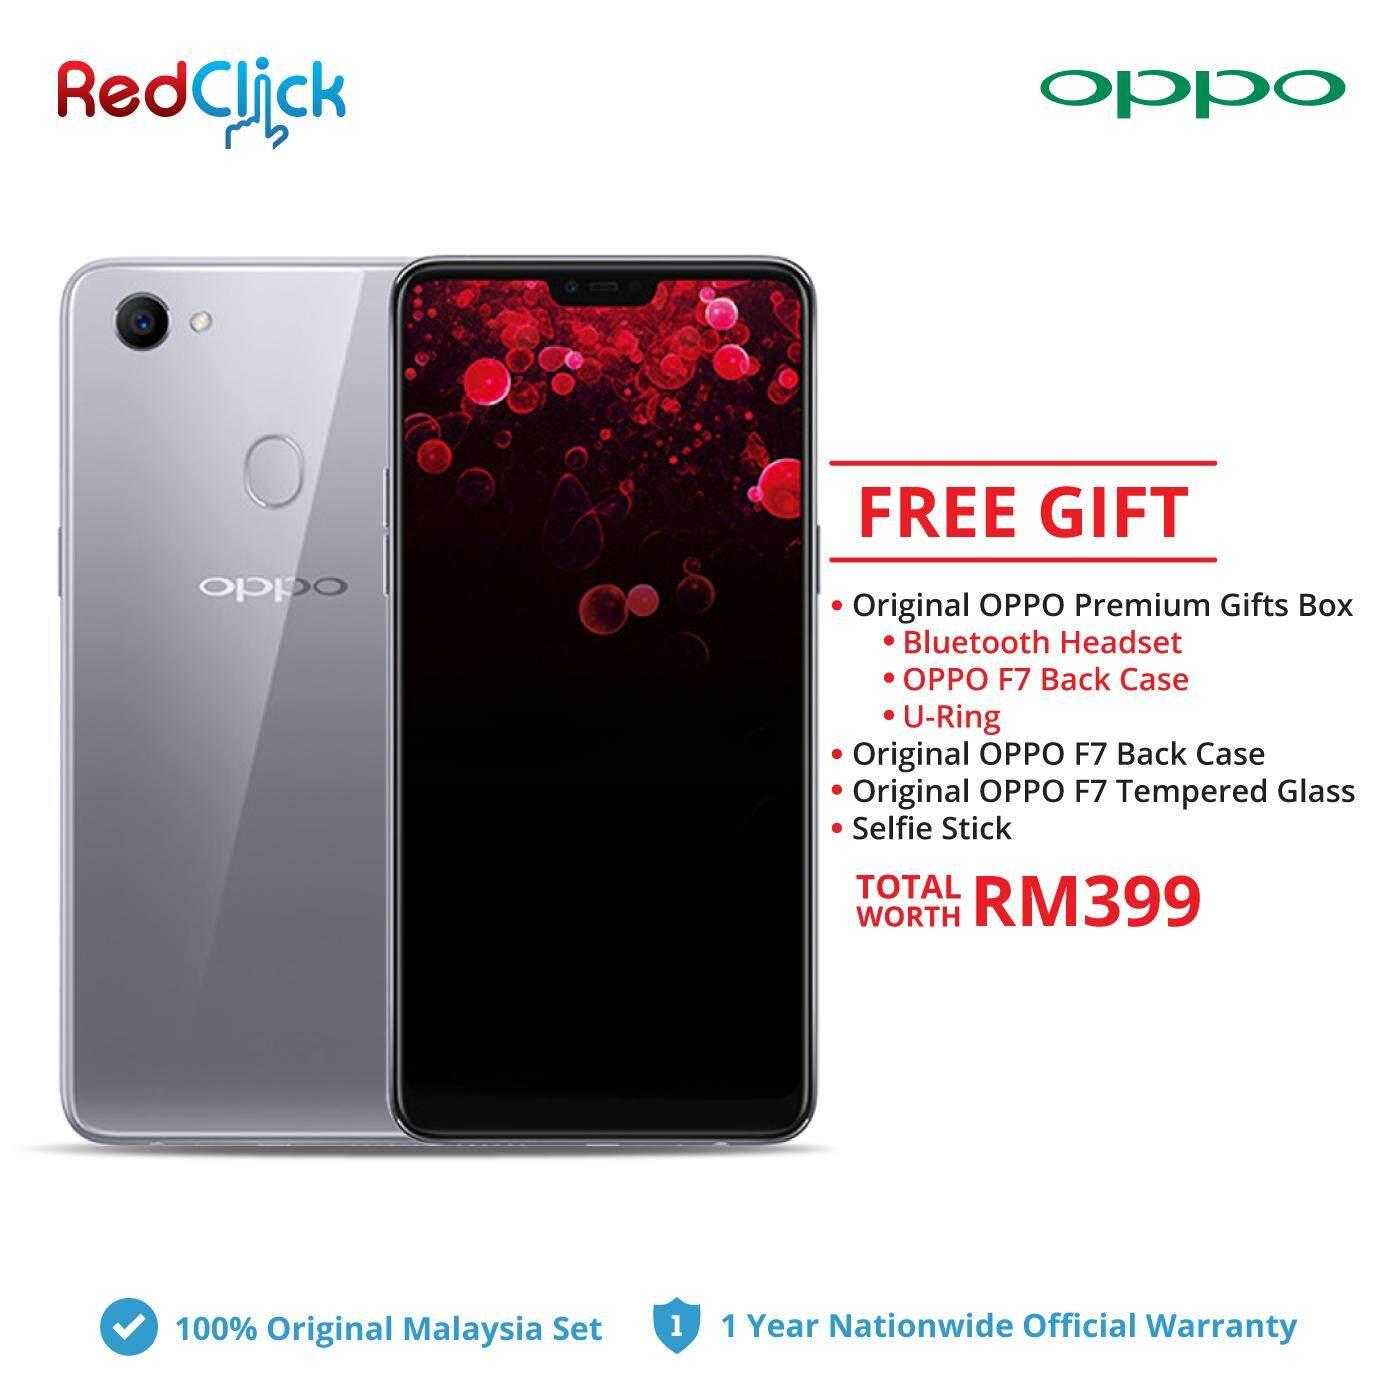 OPPO F7 (4GB/64GB) + 4 Free Gift Worth RM399